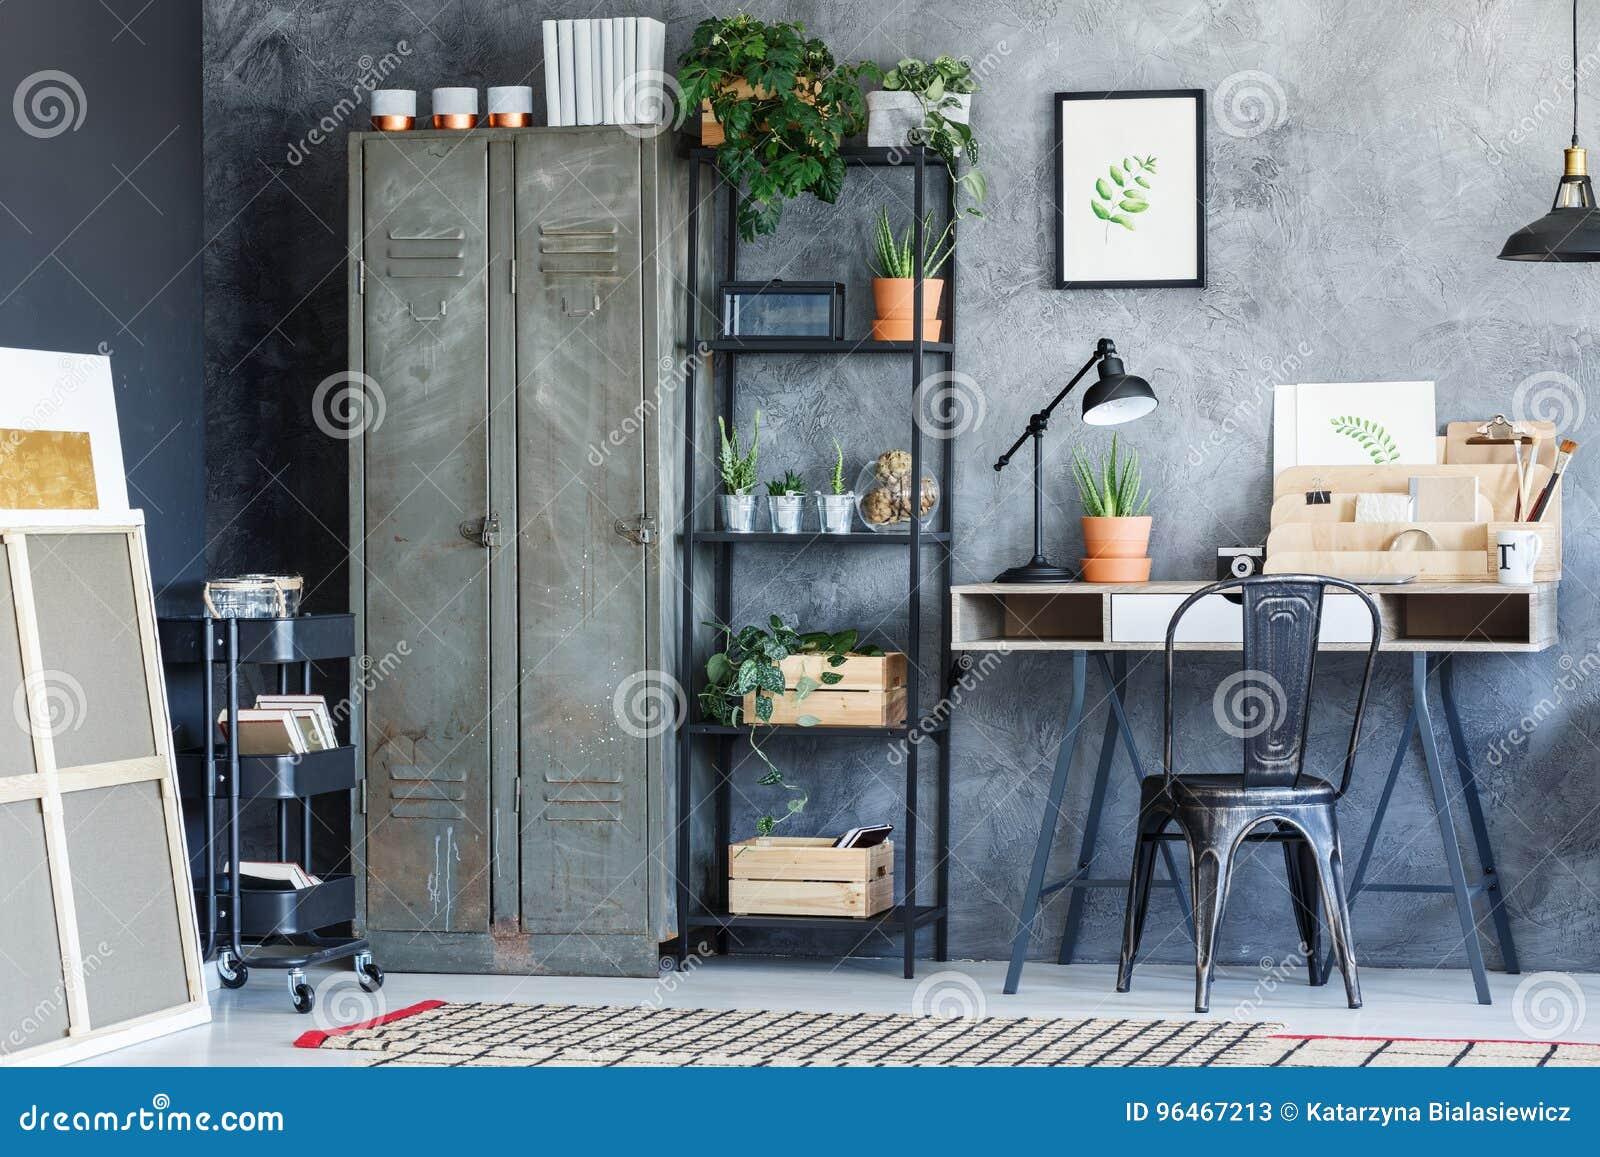 Industrial Creative Study Room Stock Image Image of desk estate